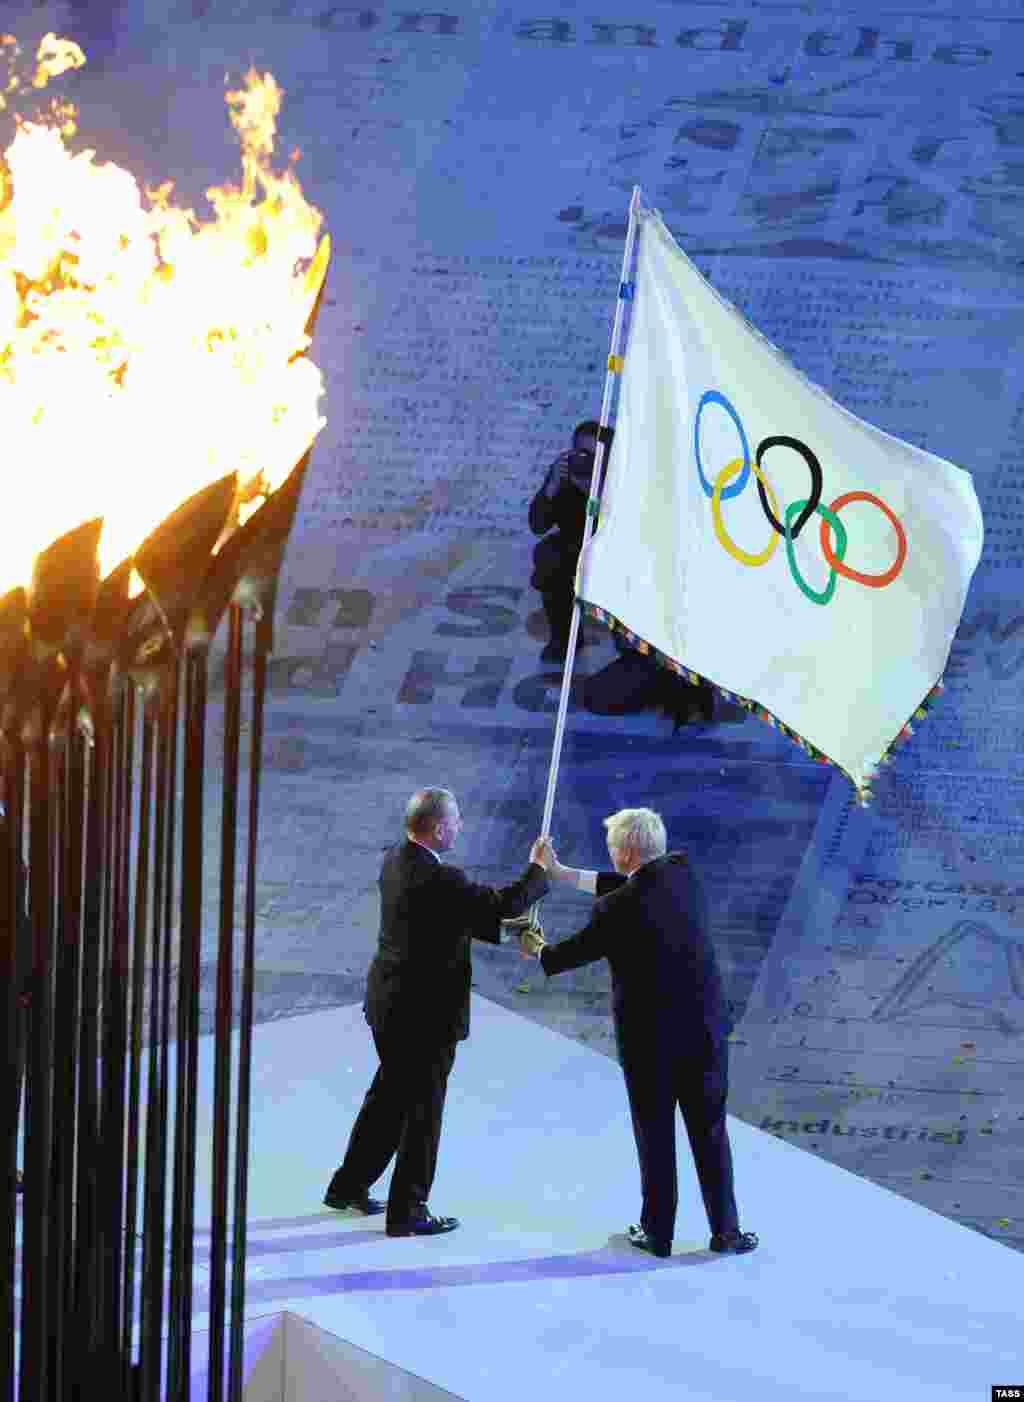 Президент Международного Олимпийского Комитета Жак Рогге передал олимпийский флаг мэру Рио-де-Жанейро- города, где пройдёт следующая летняя Олимпиада.